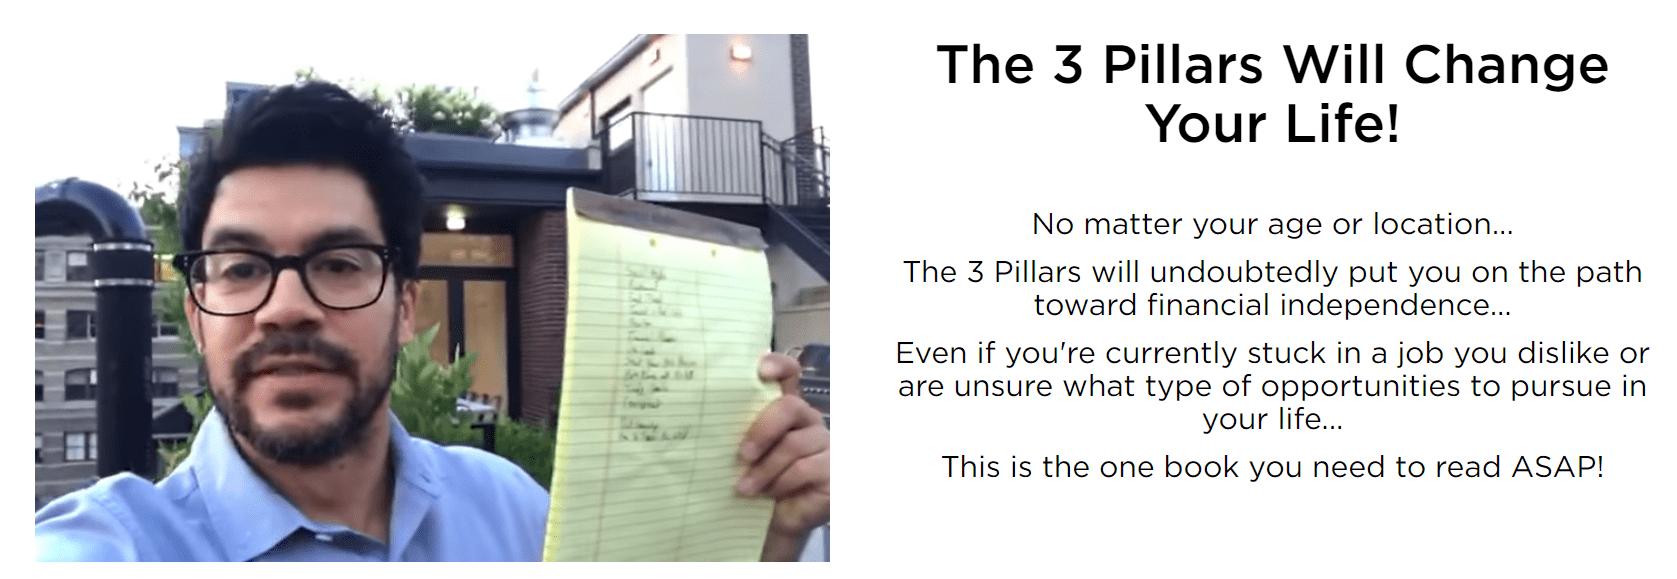 3 Pillars will change your life